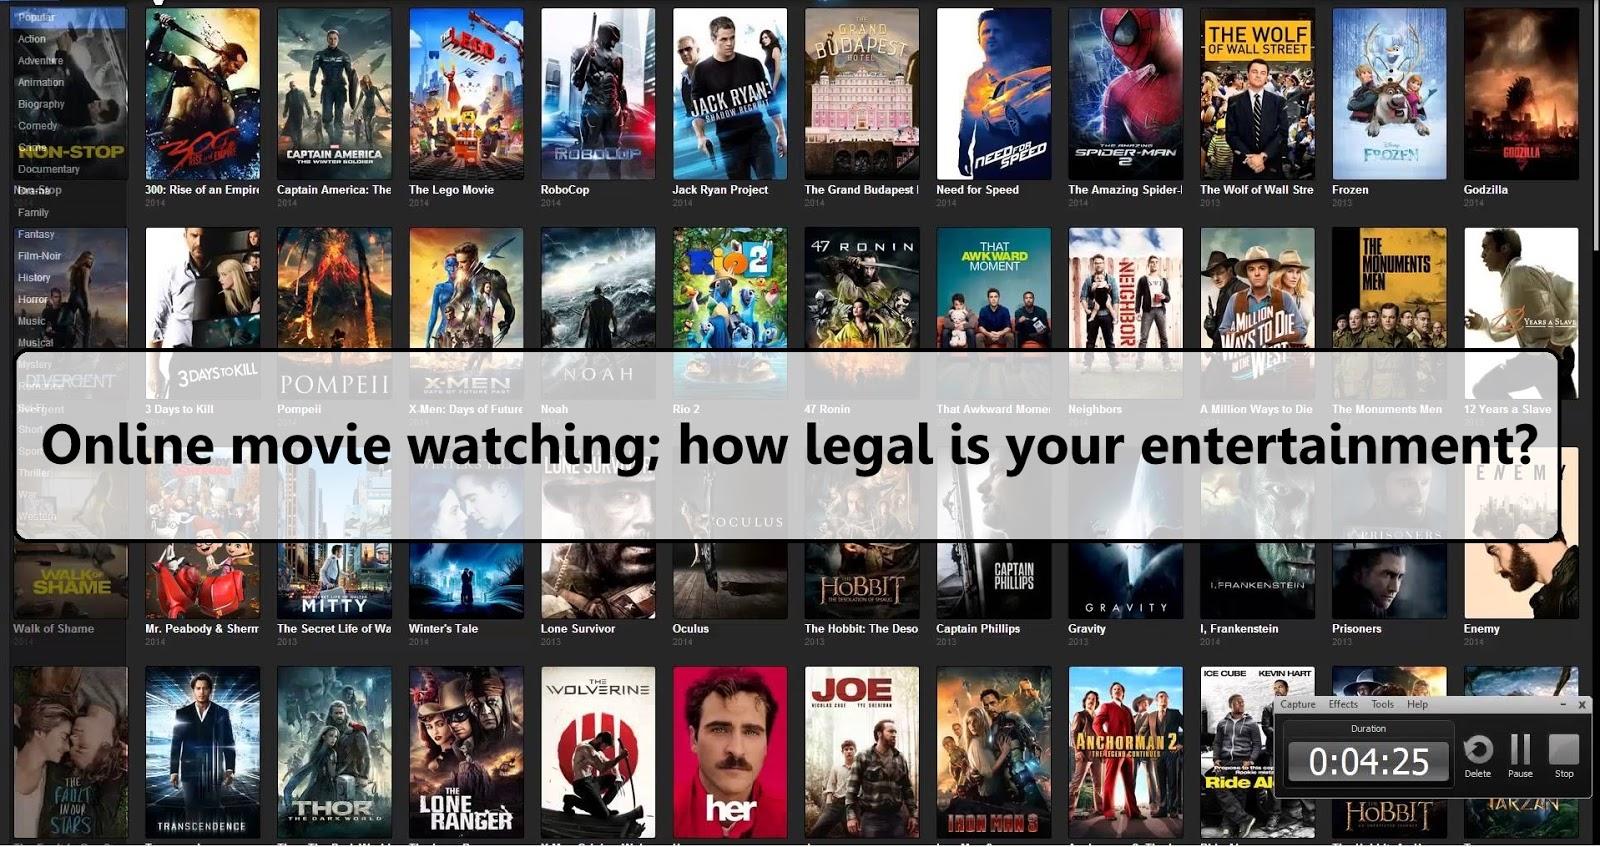 Watching movie online legal